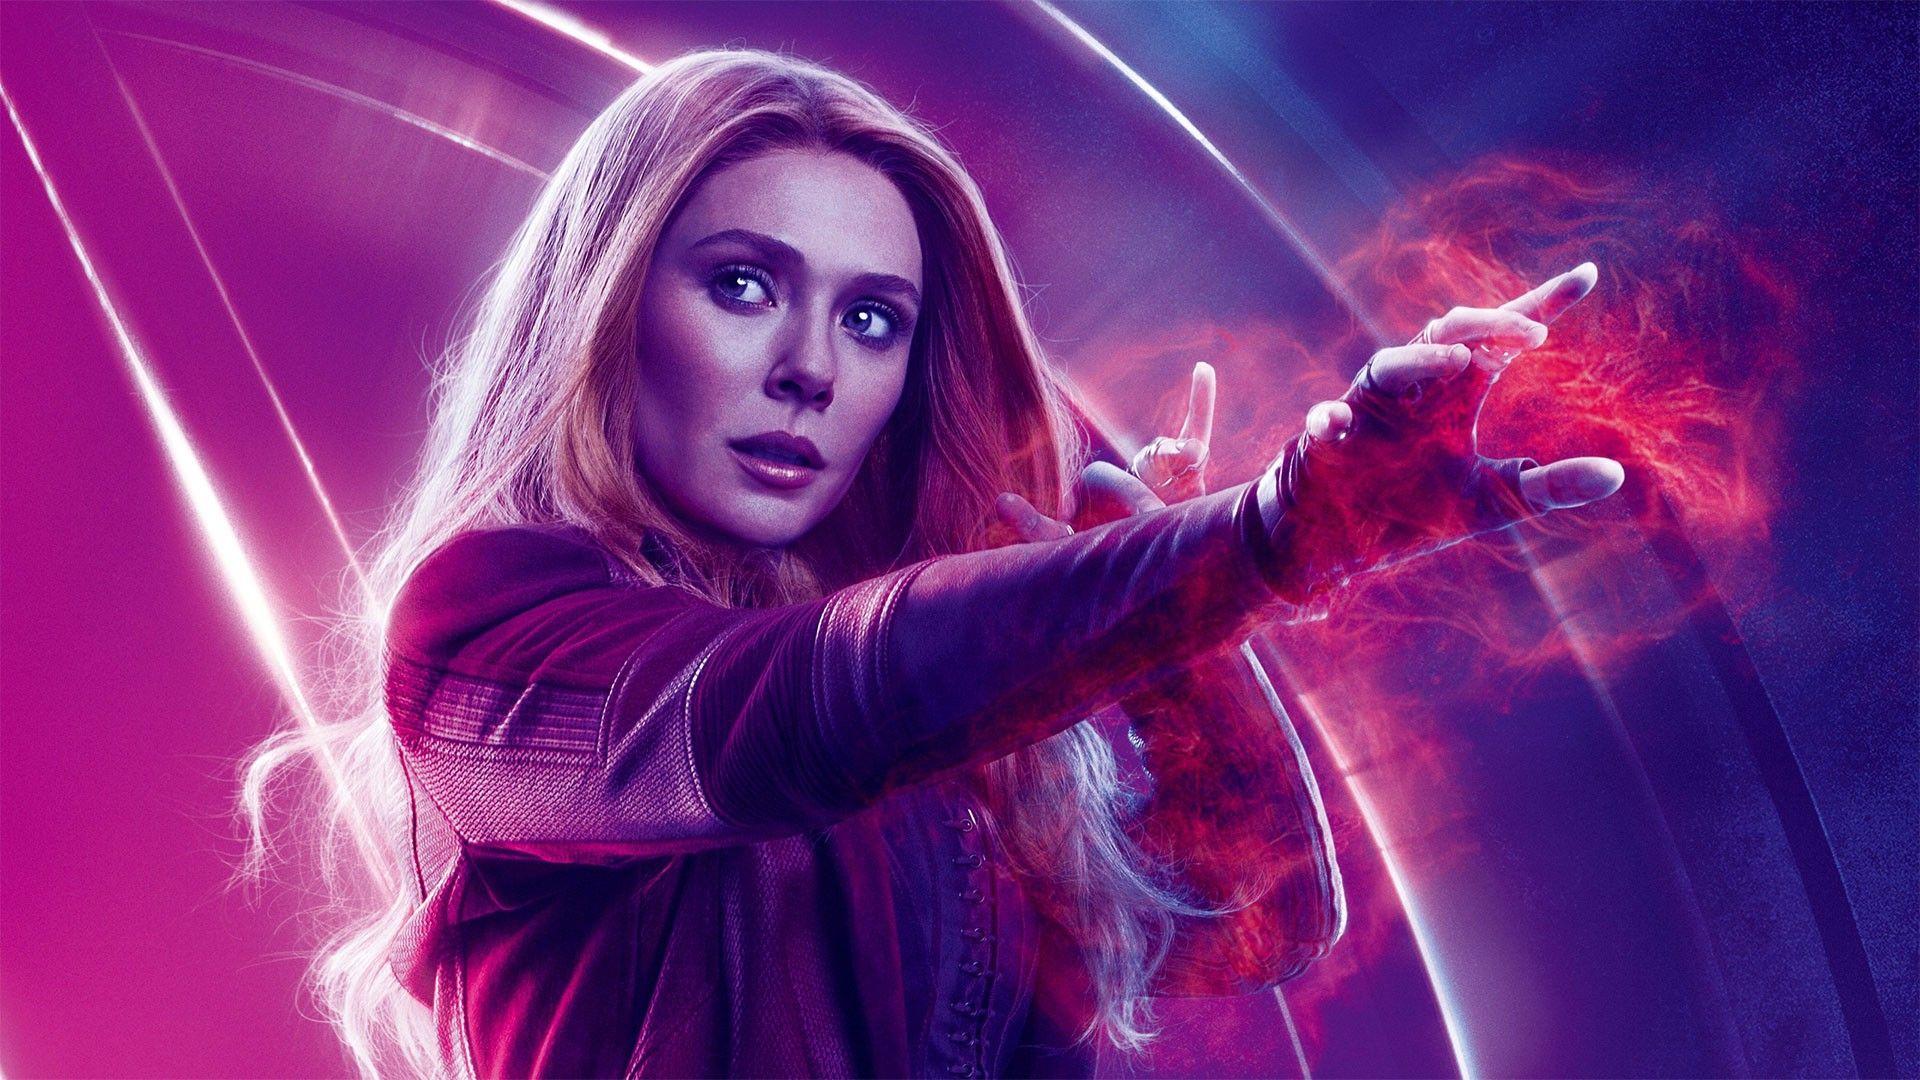 Elizabeth Olsen Scarlet Witch Avengers Endgame Wallpaper Hd Best Movie Poster Wallpaper Hd Scarlet Witch Avengers Scarlet Witch Marvel Scarlet Witch